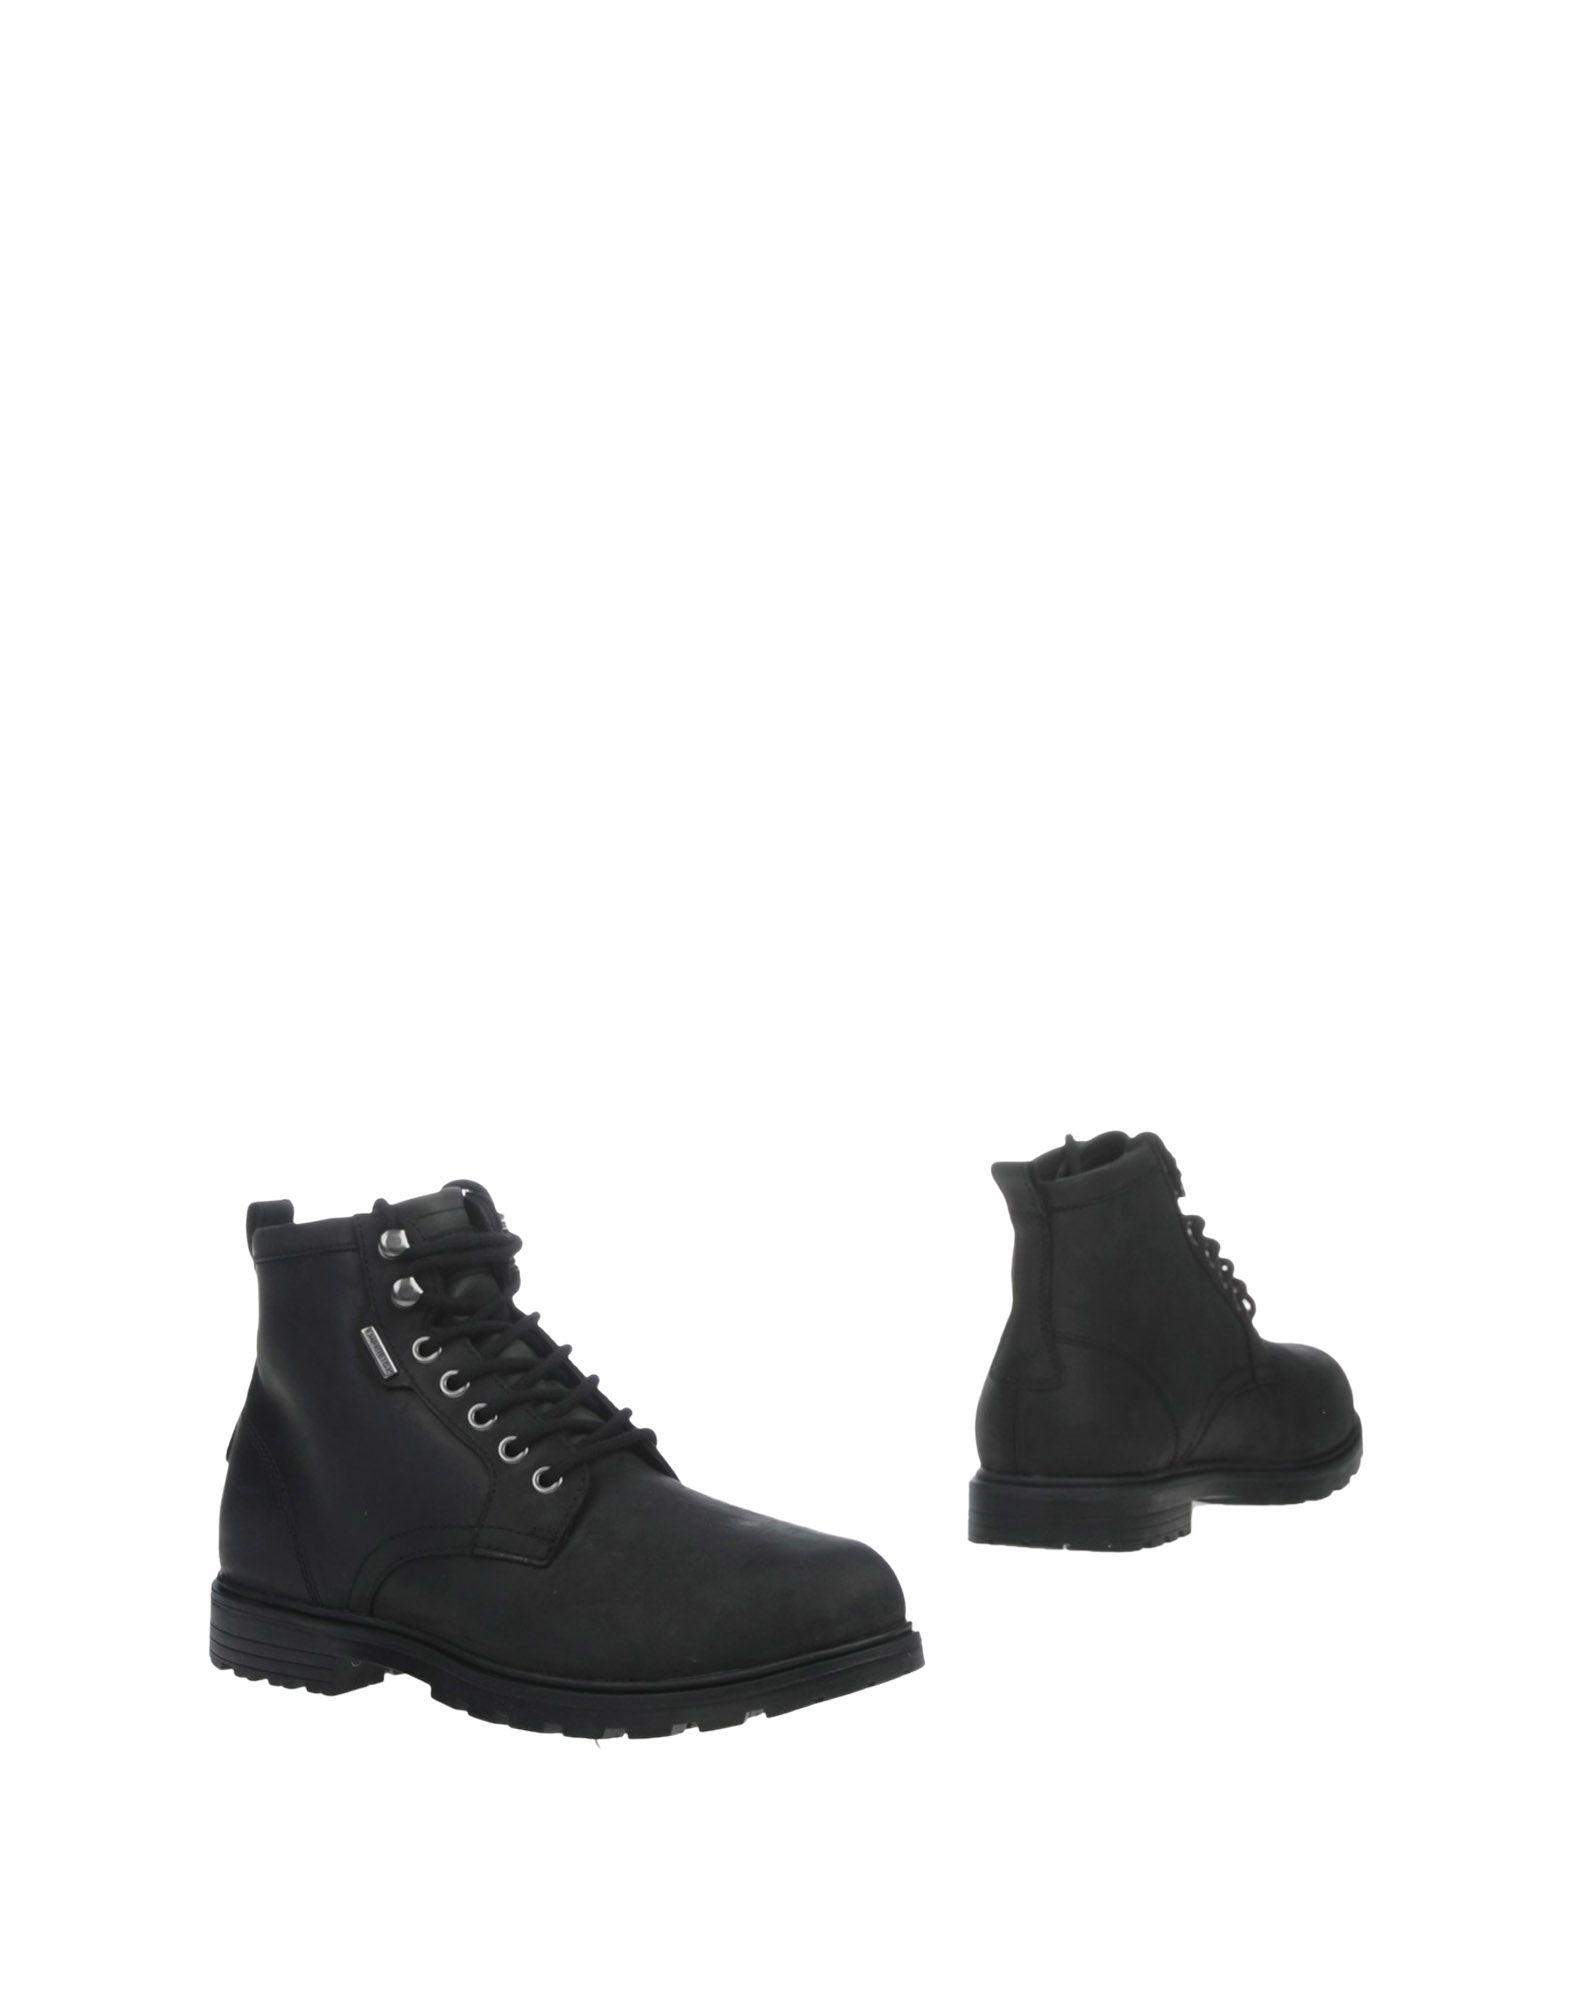 Geox Stiefelette Herren  Schuhe 11322277RR Heiße Schuhe  bea8c4